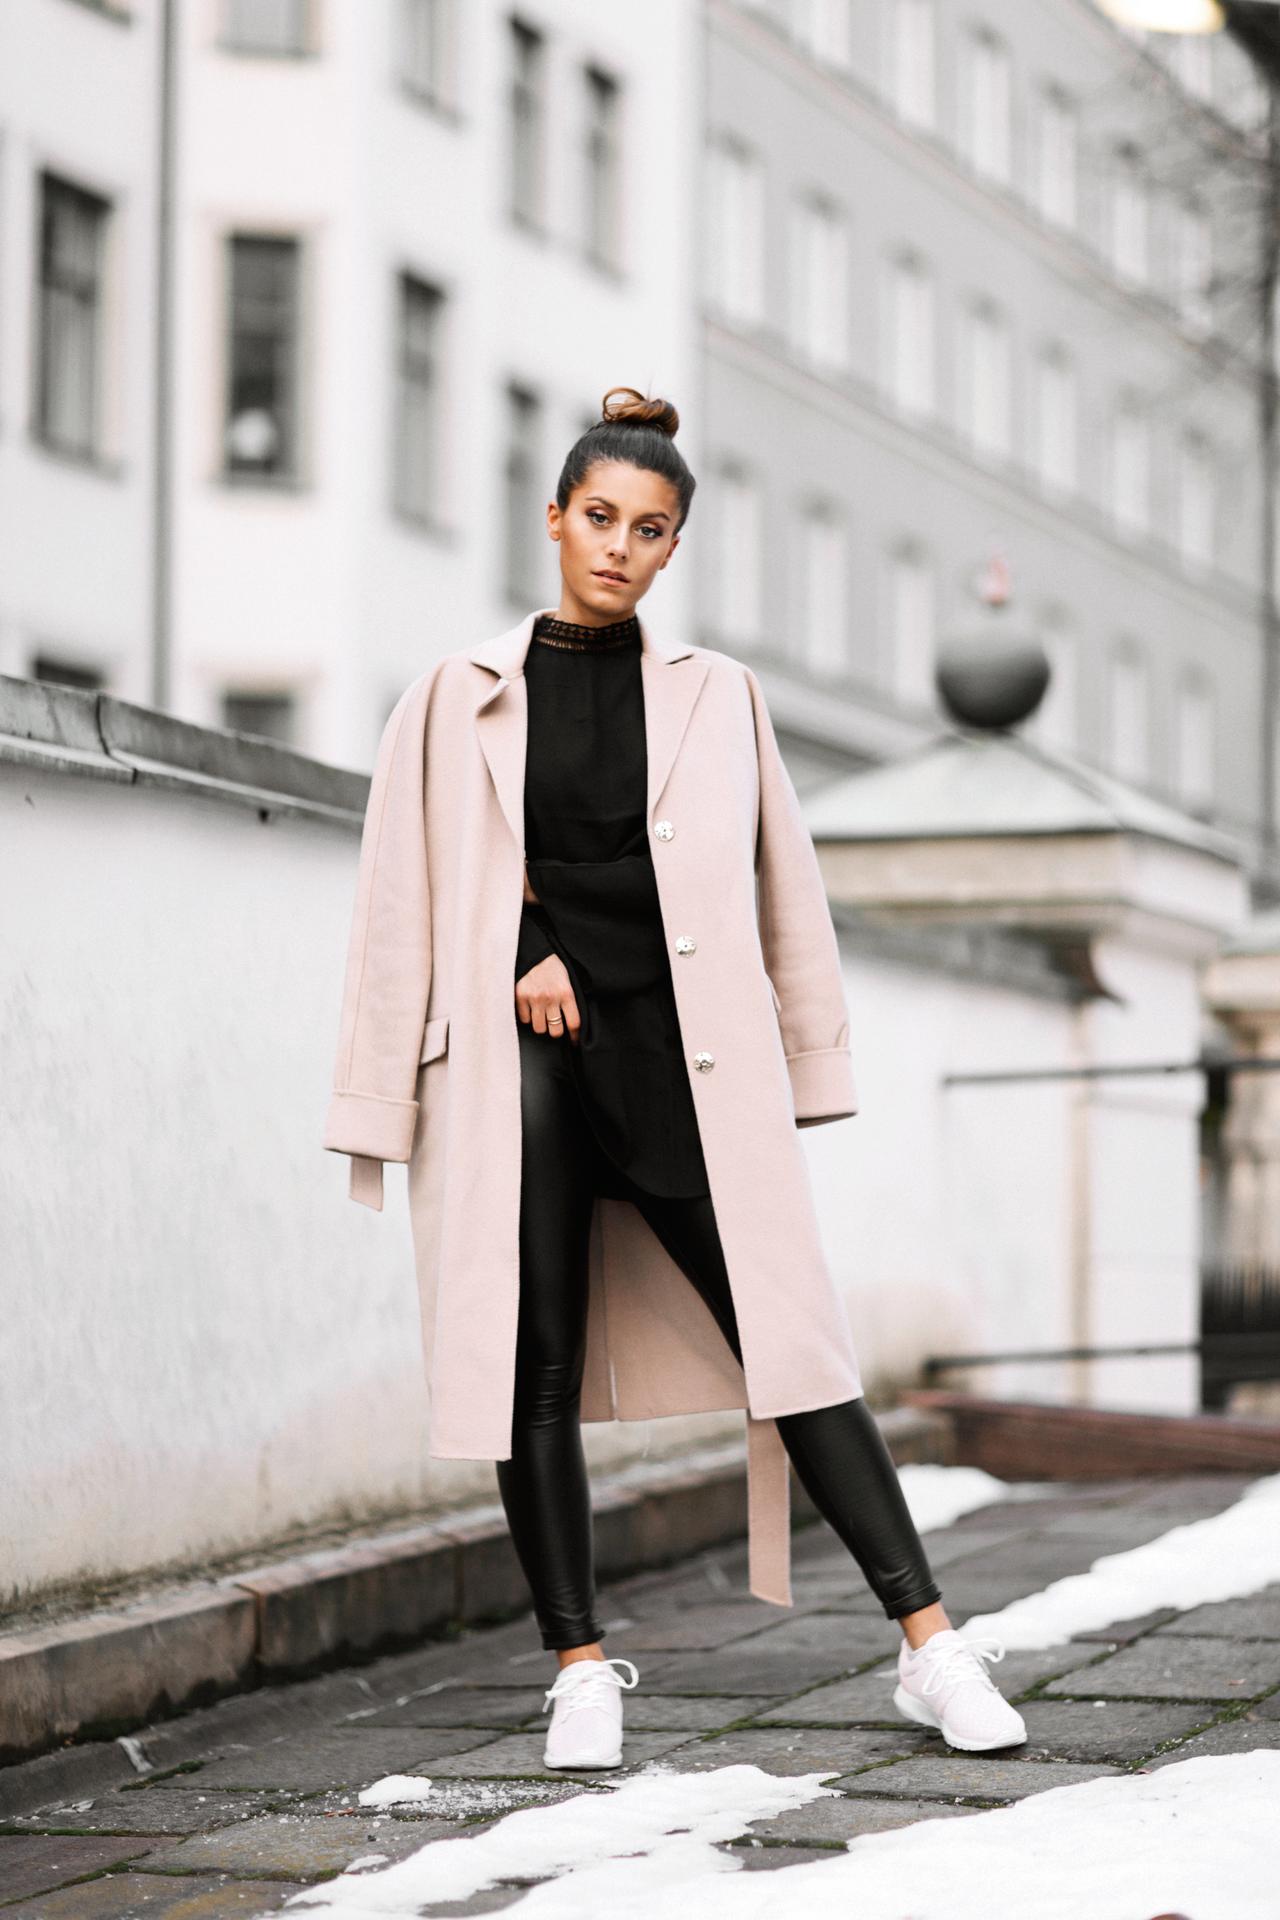 mantel Trends 2019: Das sind die Must haves   Winter coat